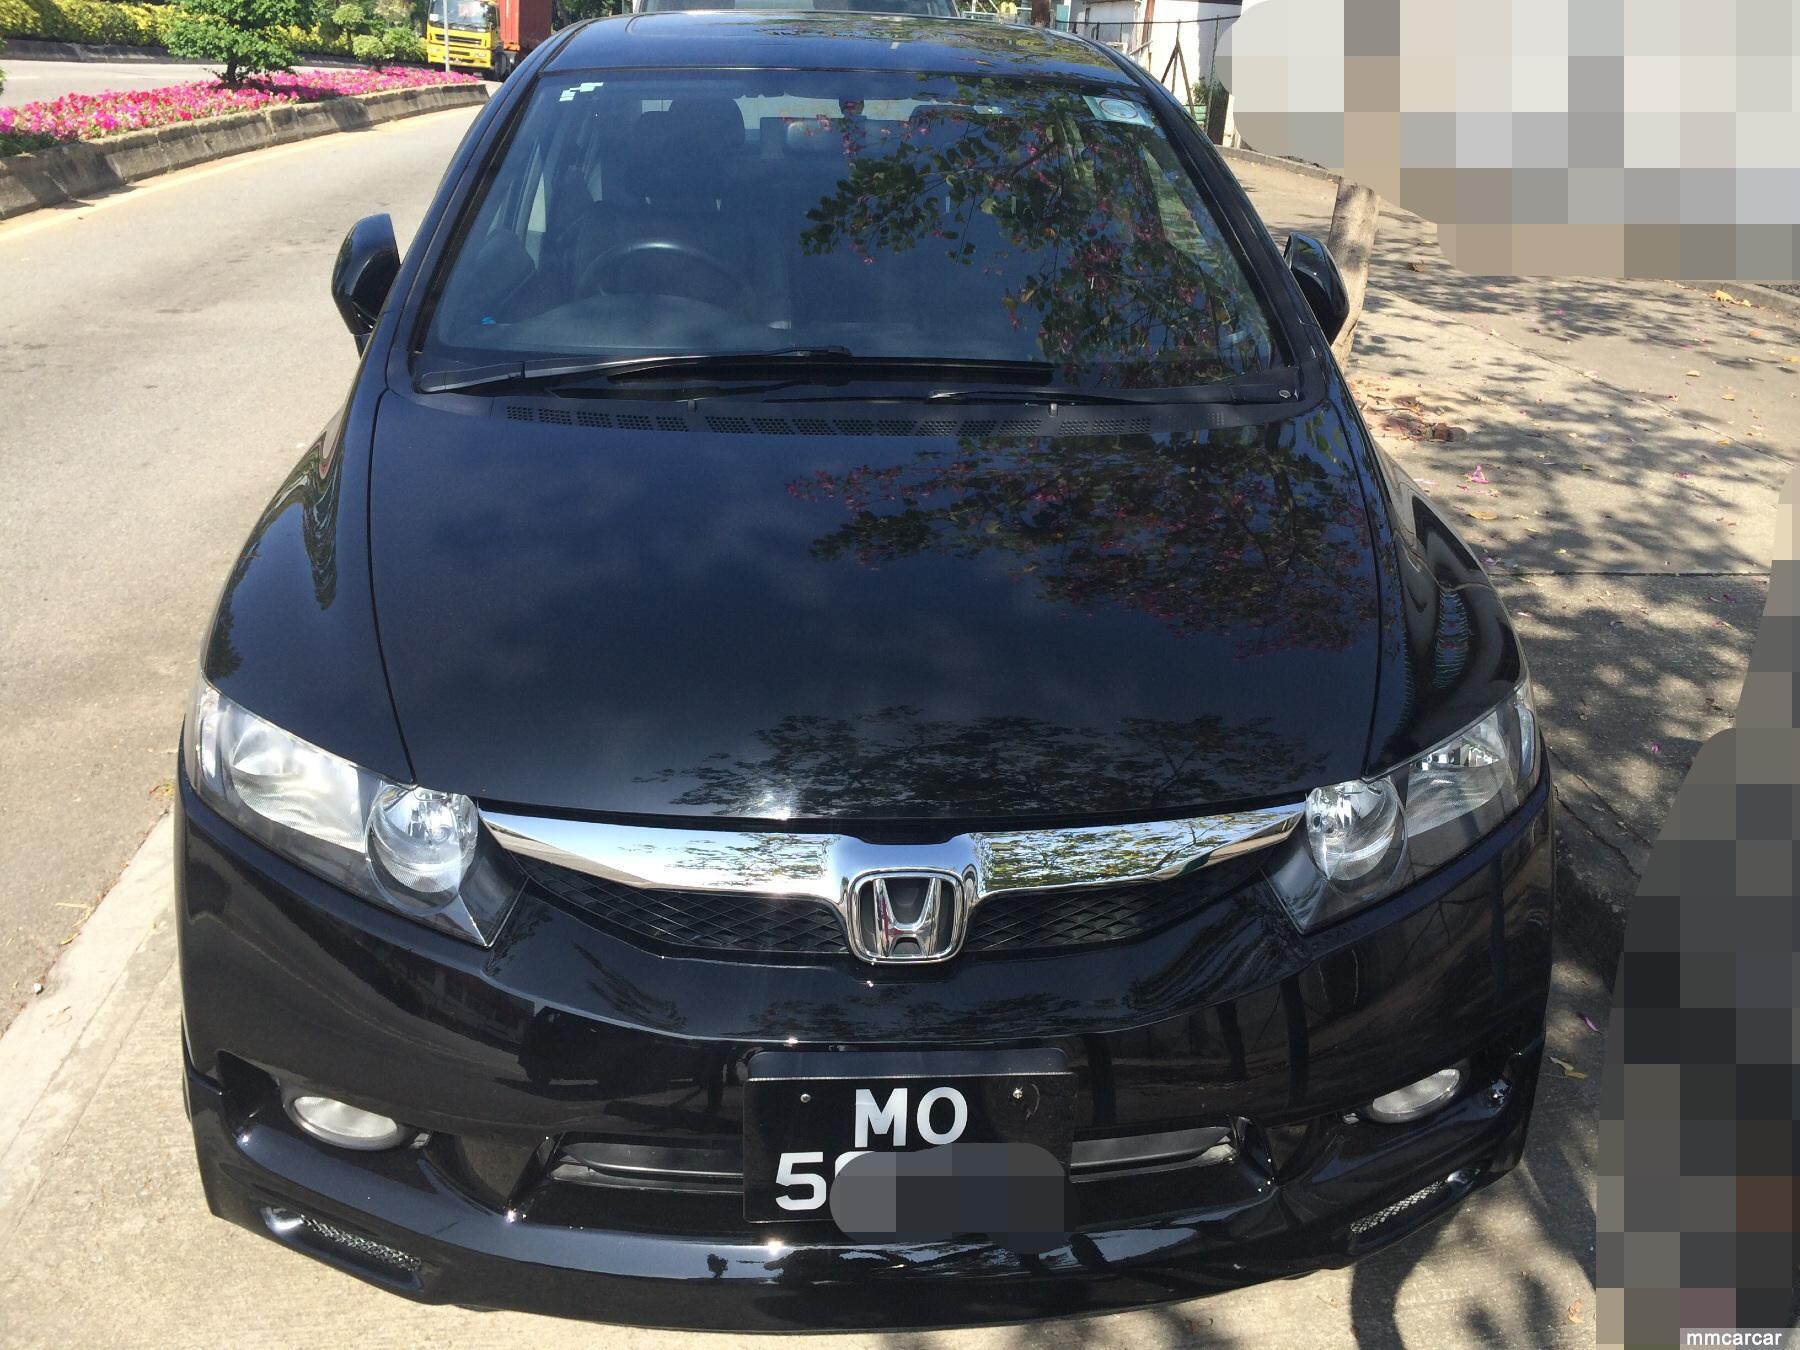 本田vti思域1.8cc黑色mo5特价9万余